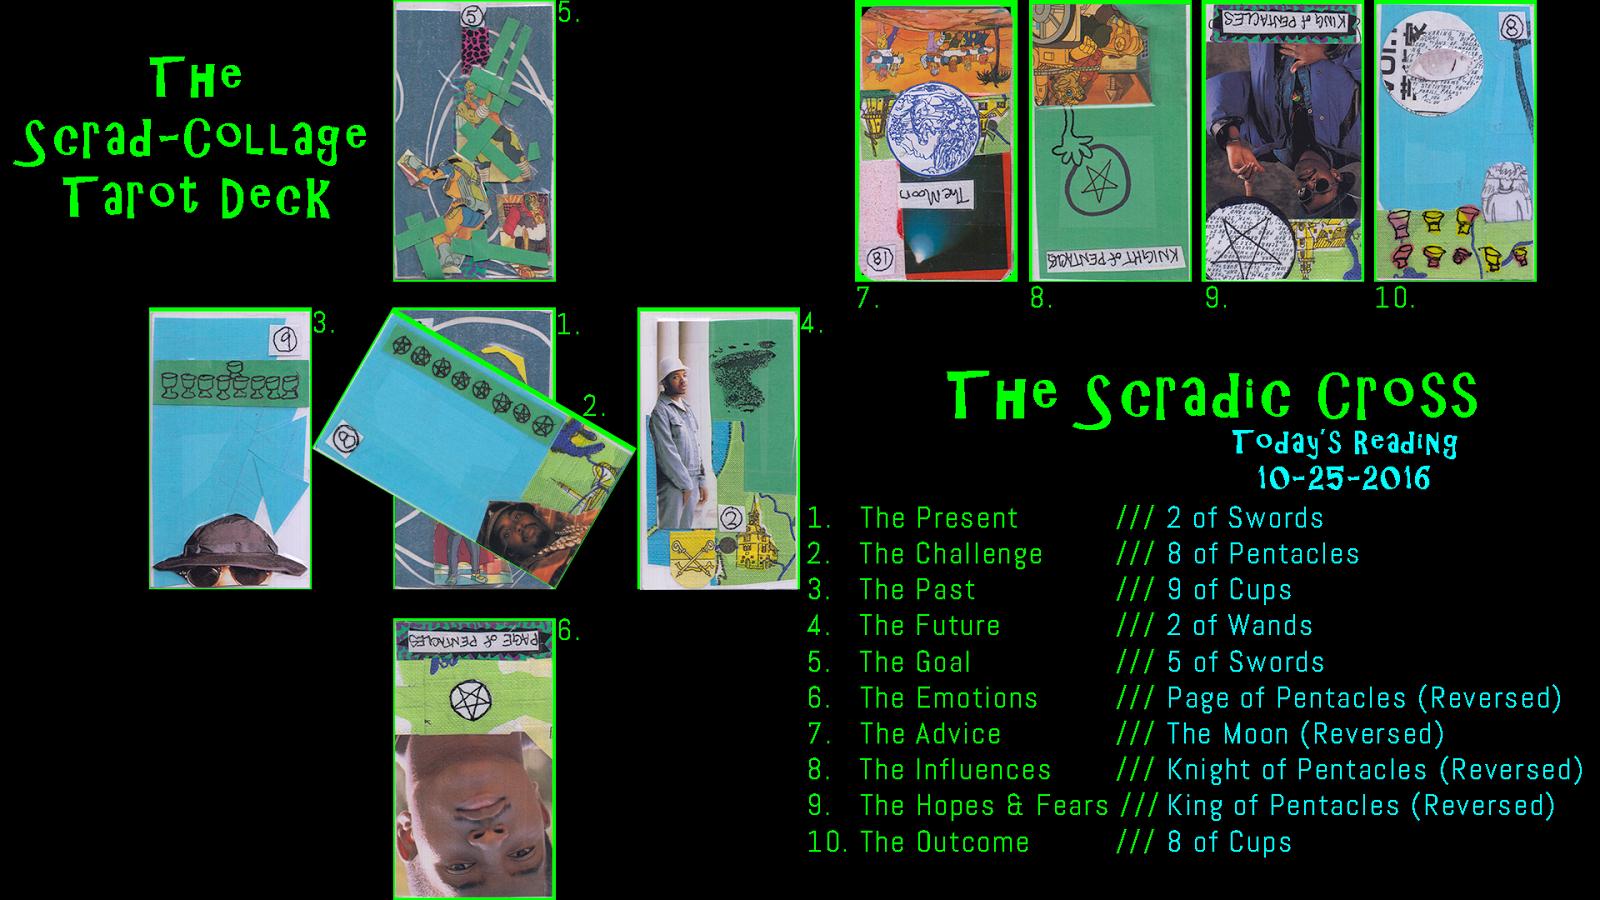 The Scrad-Collage Tarot Deck: October 2016